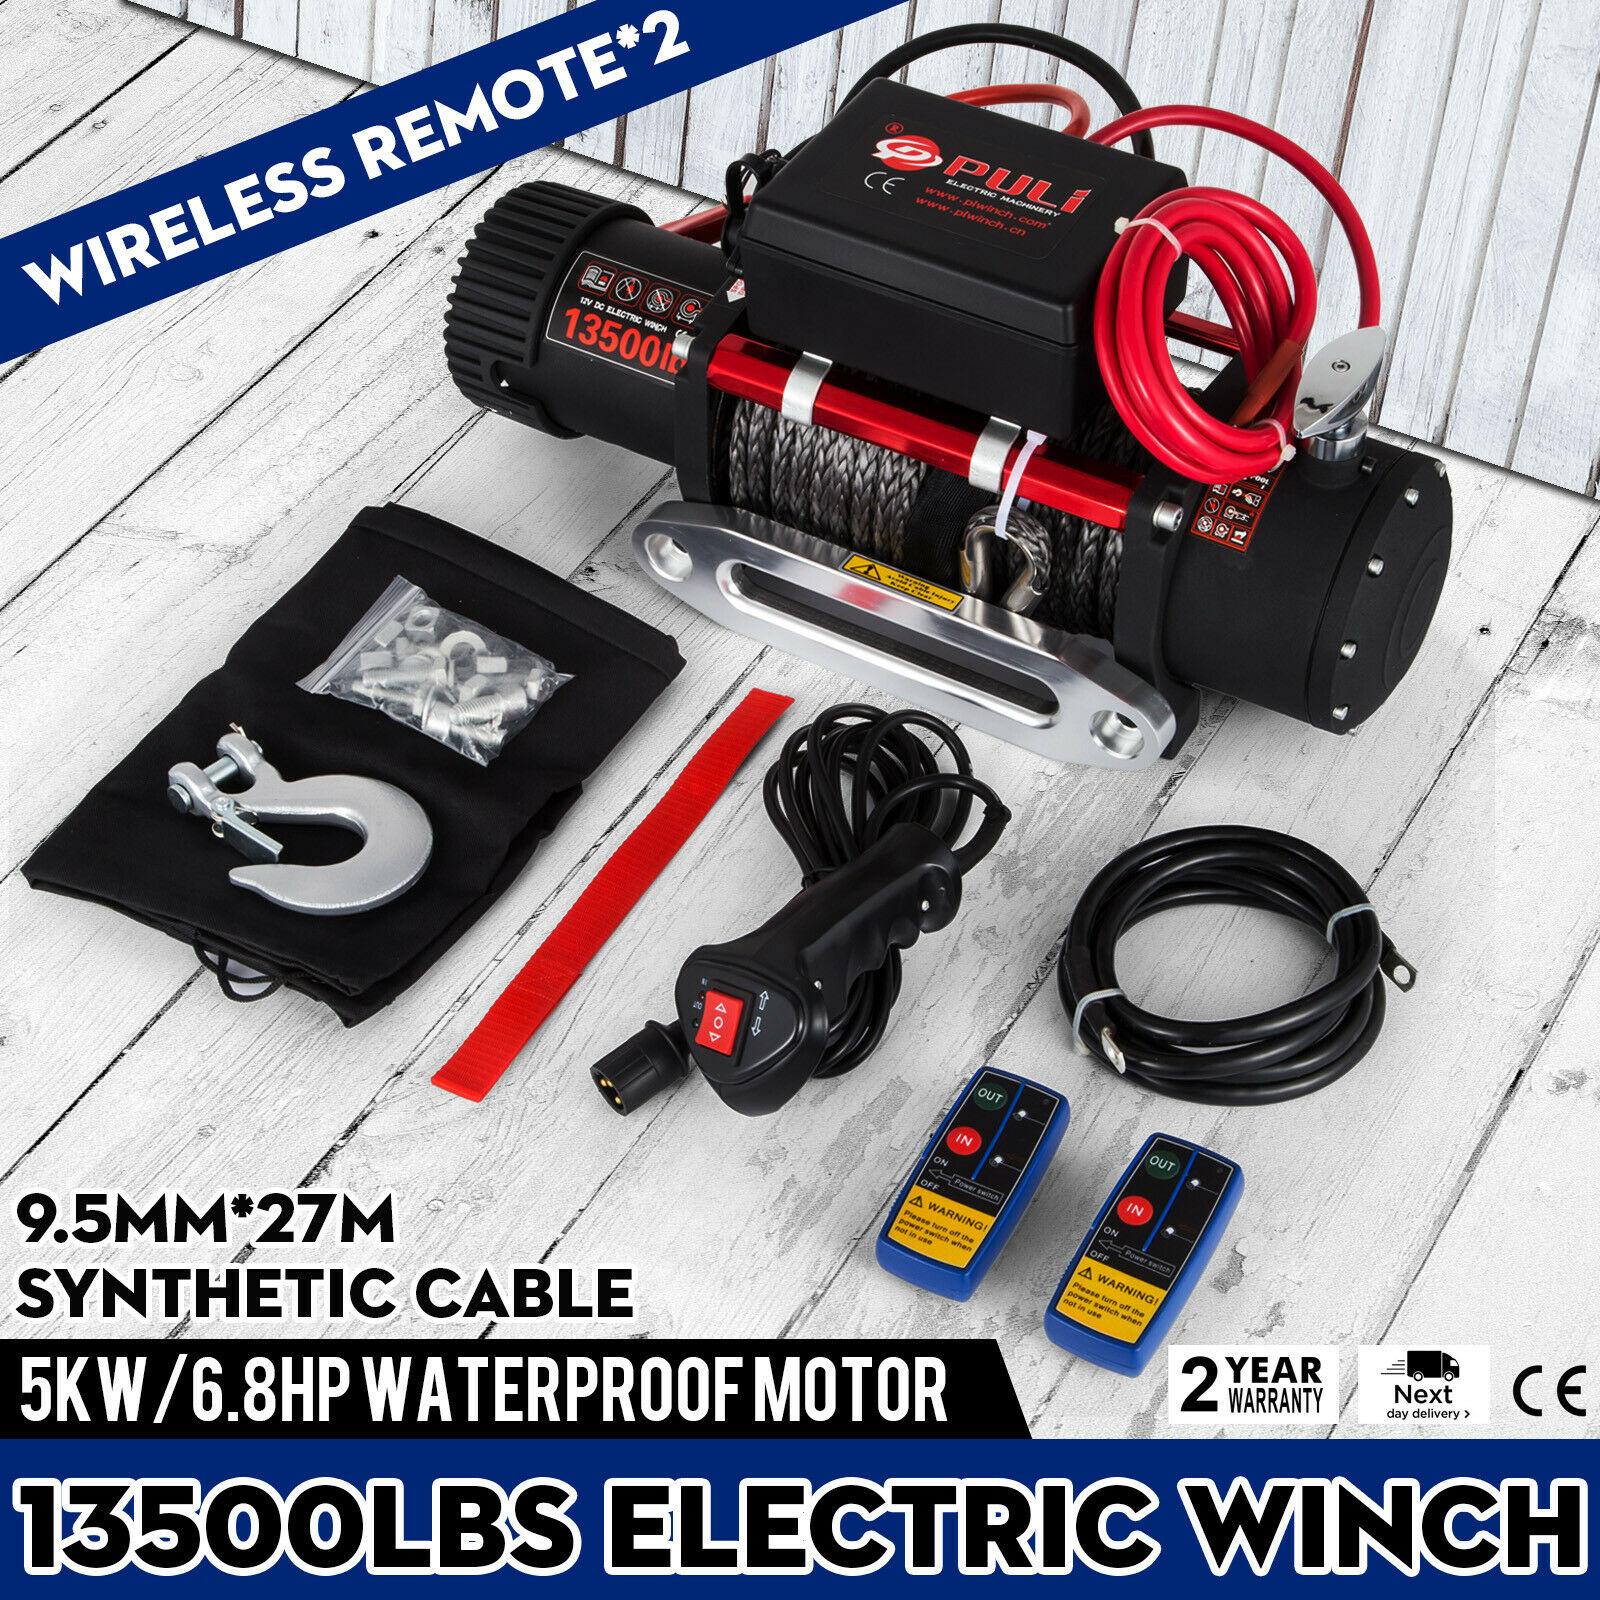 Электрическая лебедка 13500lb 12V синтетическая лебедка WINCHMAX 4x 4/RECOVERY WIRELESS 93ft